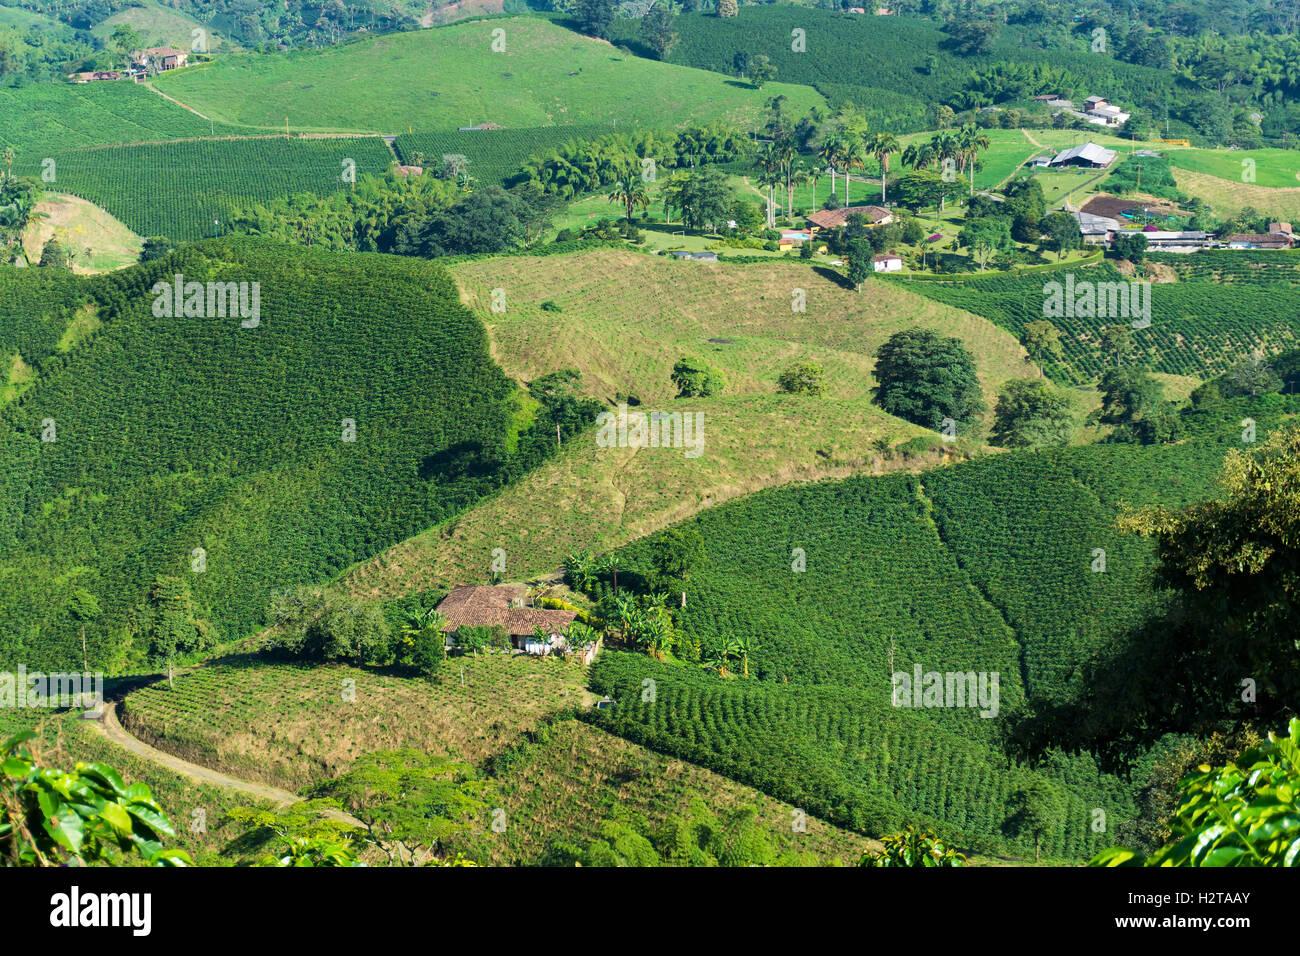 Landscape of coffee plants in the coffee growing region near Manizales, Colombia Stock Photo